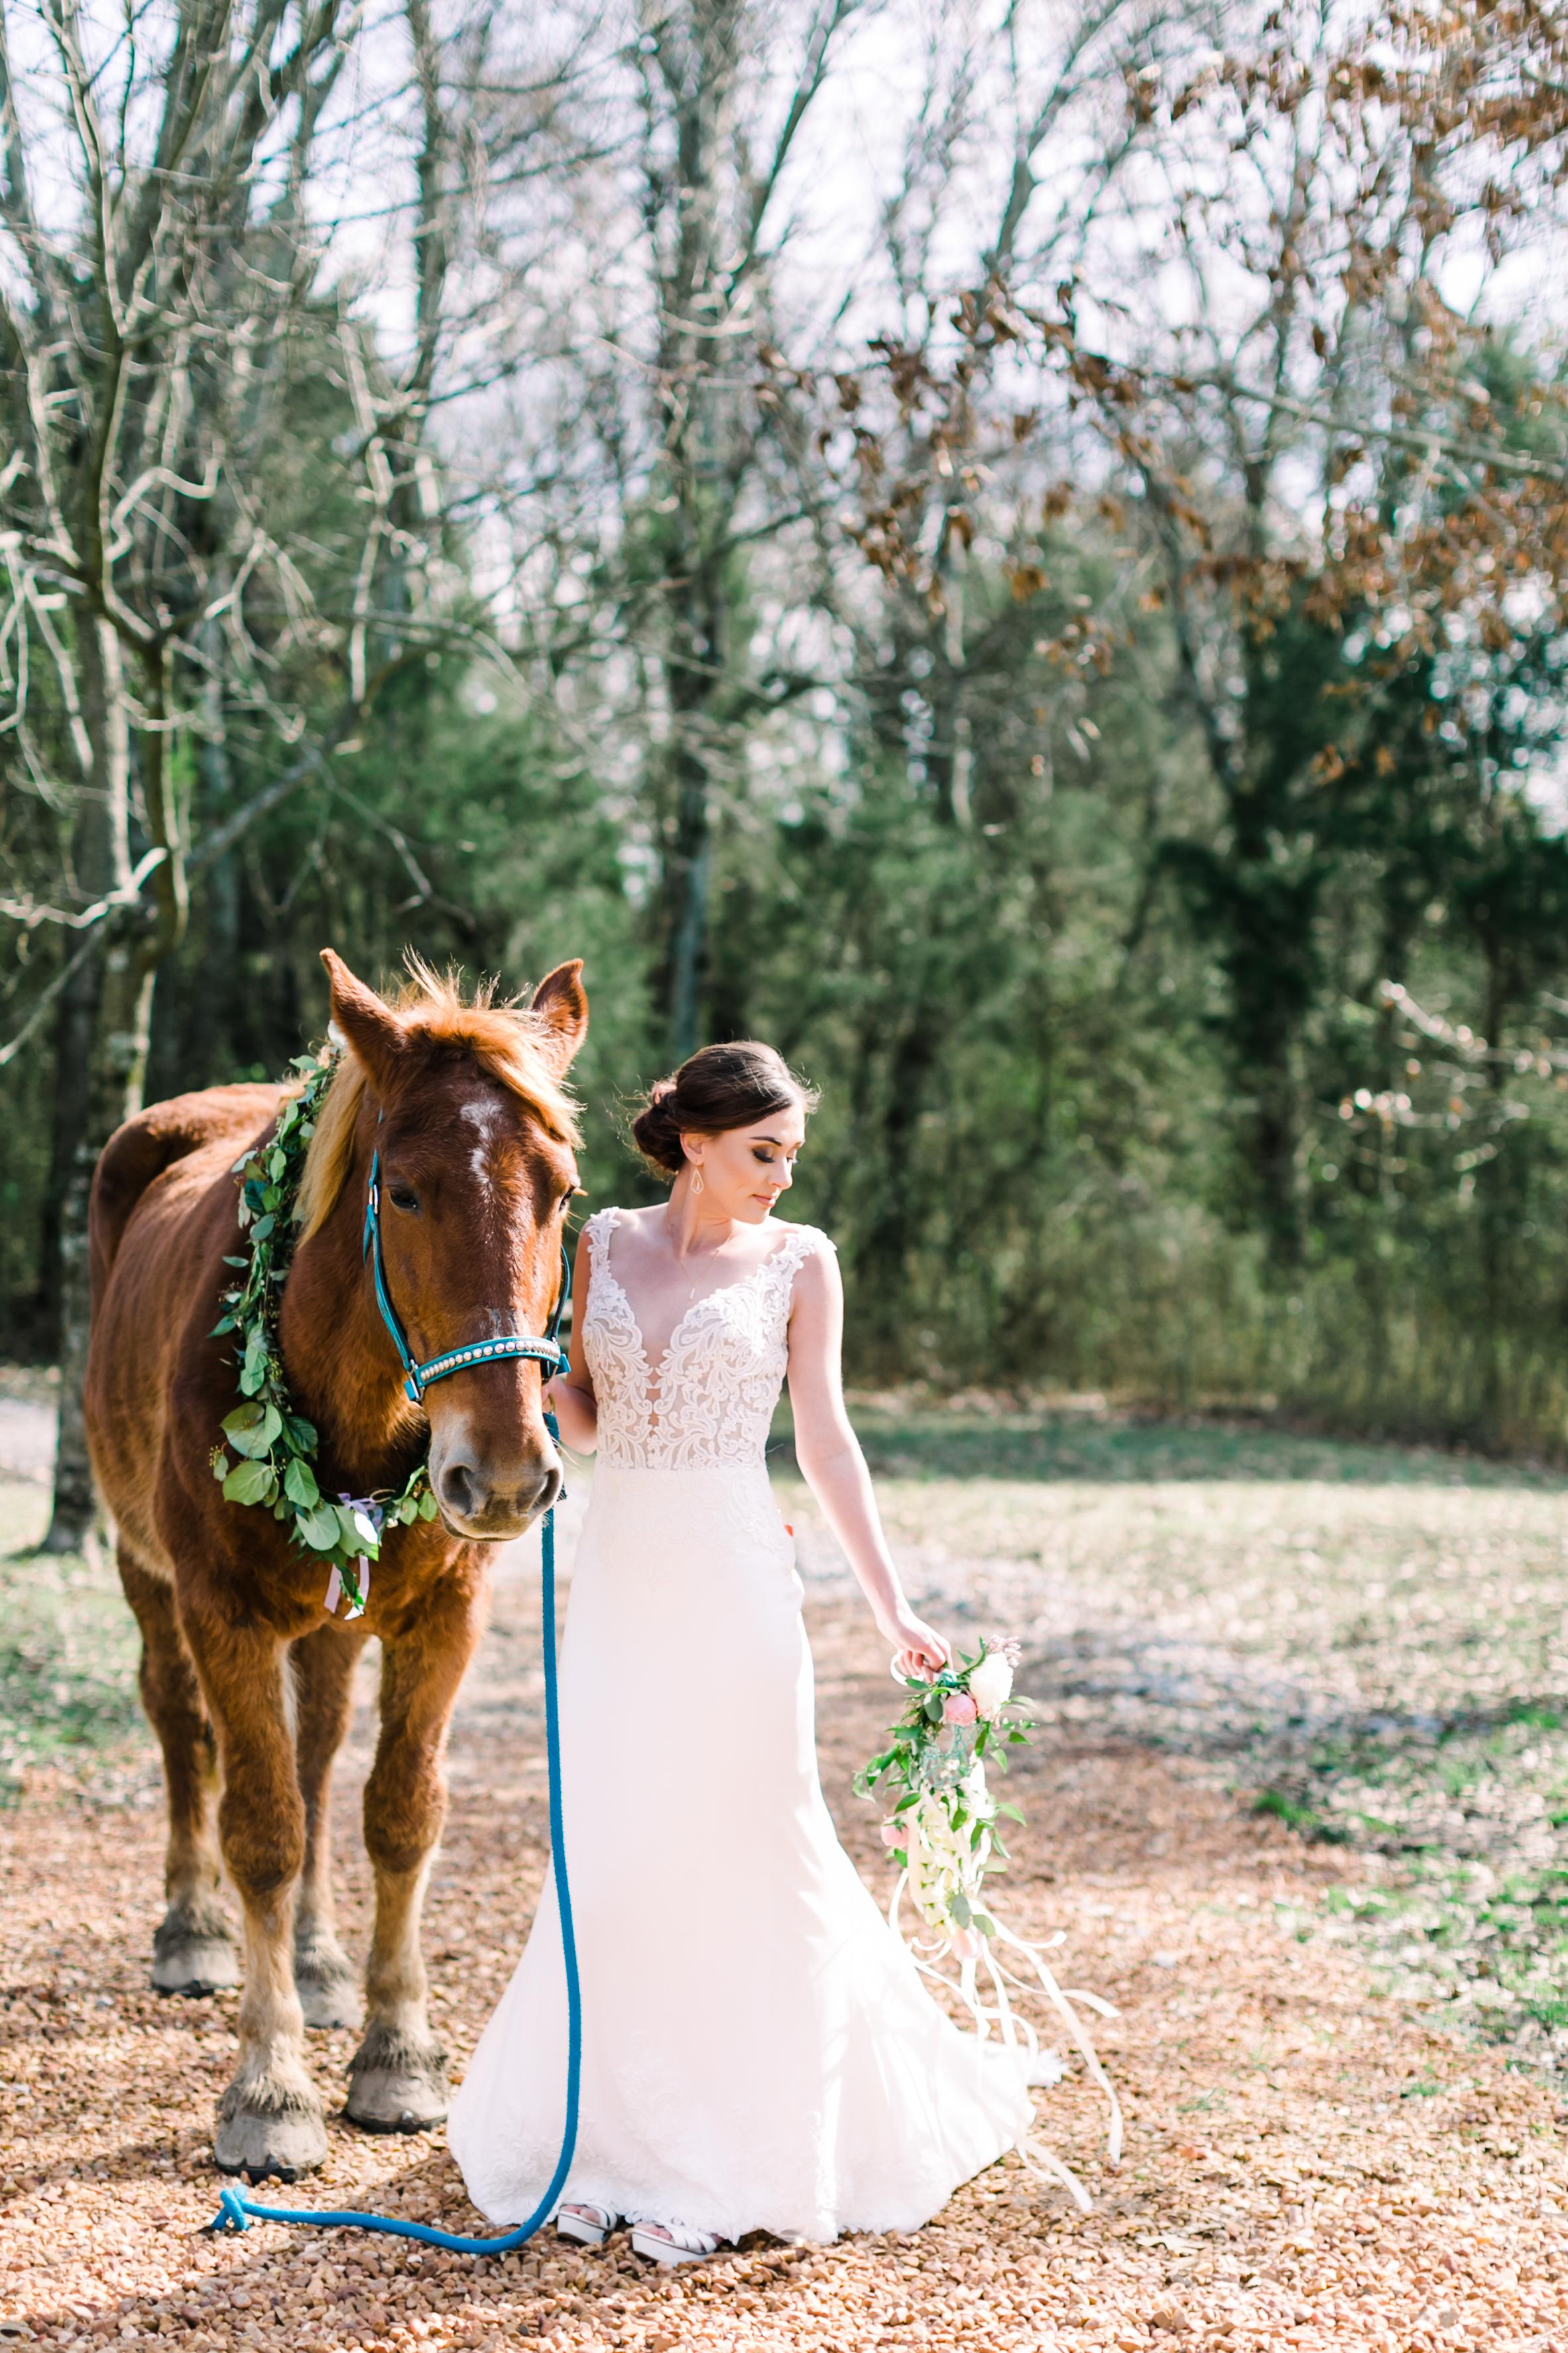 romantic+valentines+day+wedding+horses (8 of 10).jpg